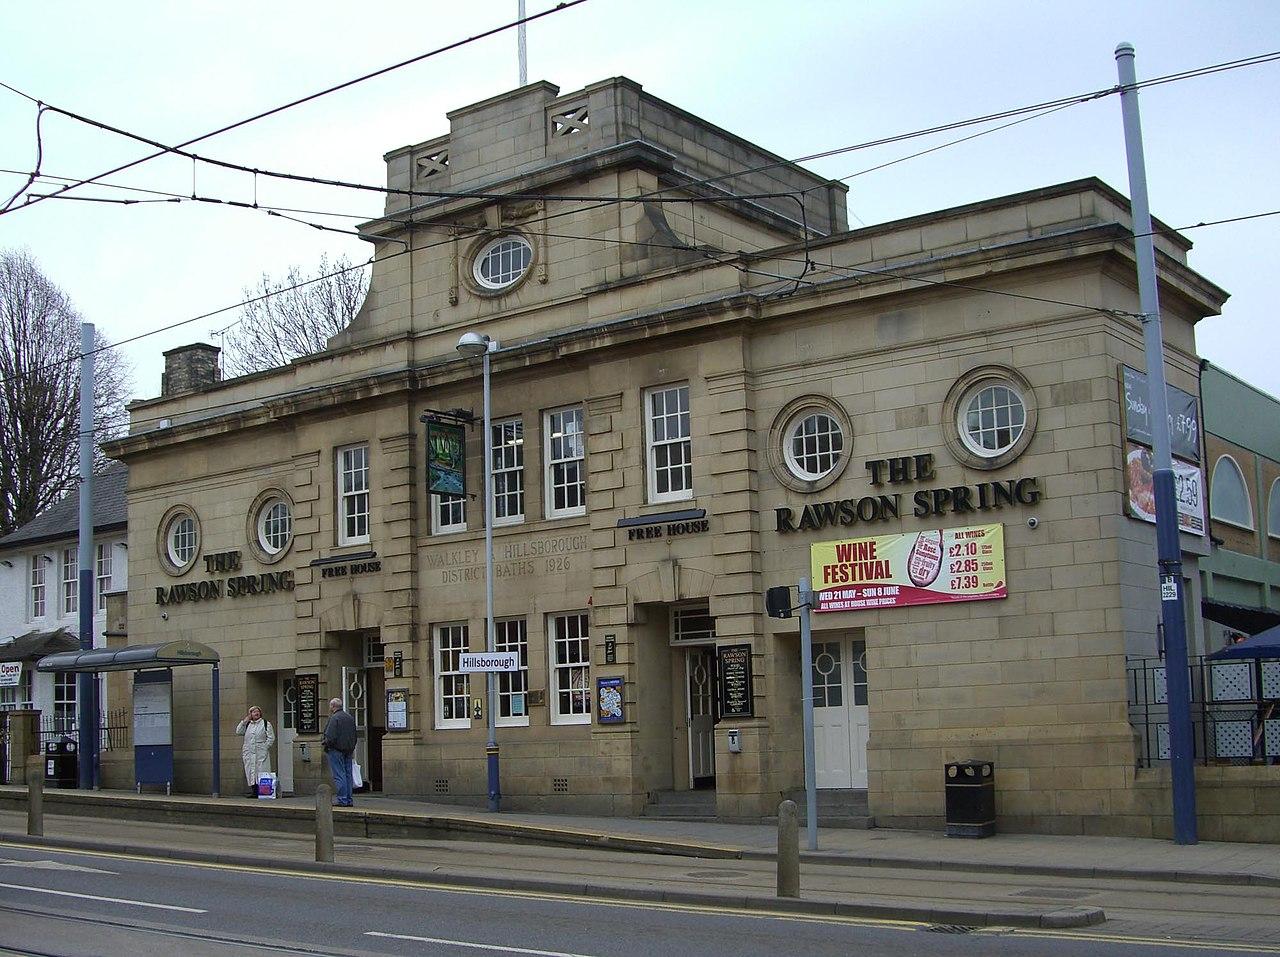 Baths Pub And Kitchen  Green Street Macclesfield Cheshire Skjh